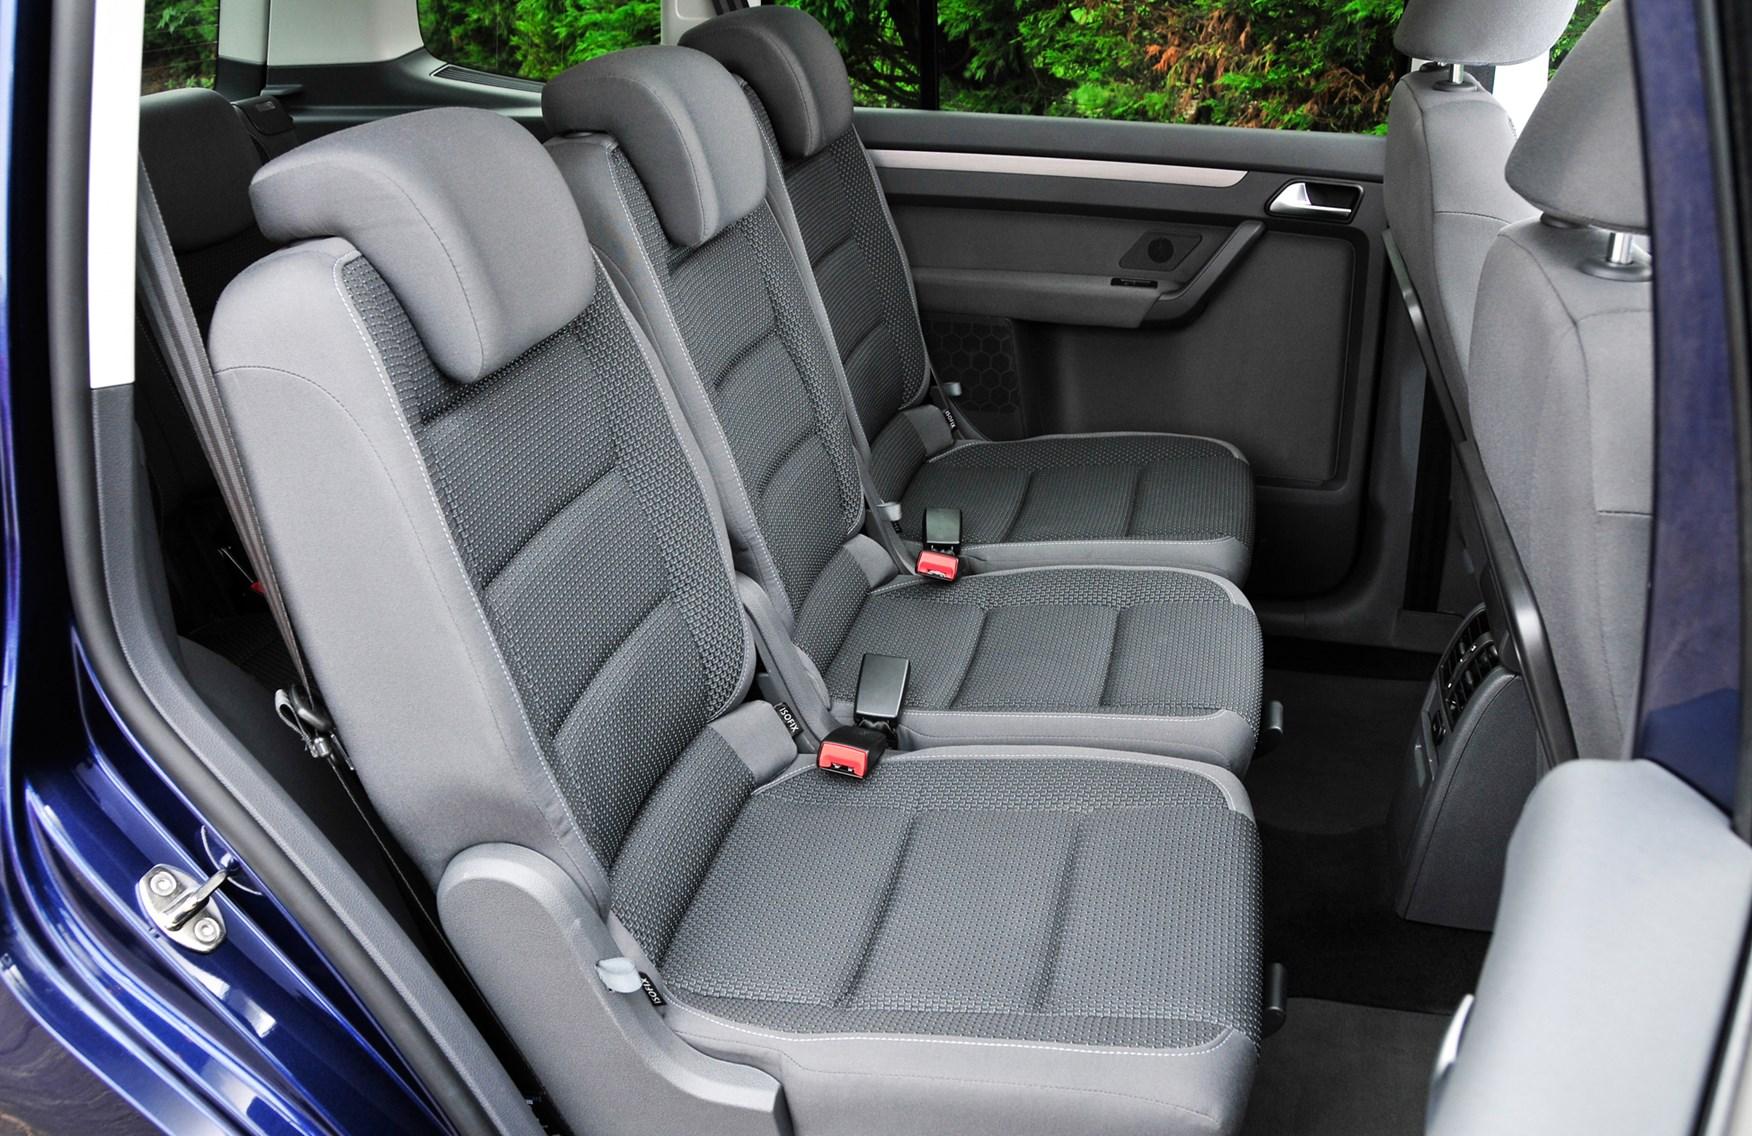 Volkswagen touran estate review 2010 2015 parkers